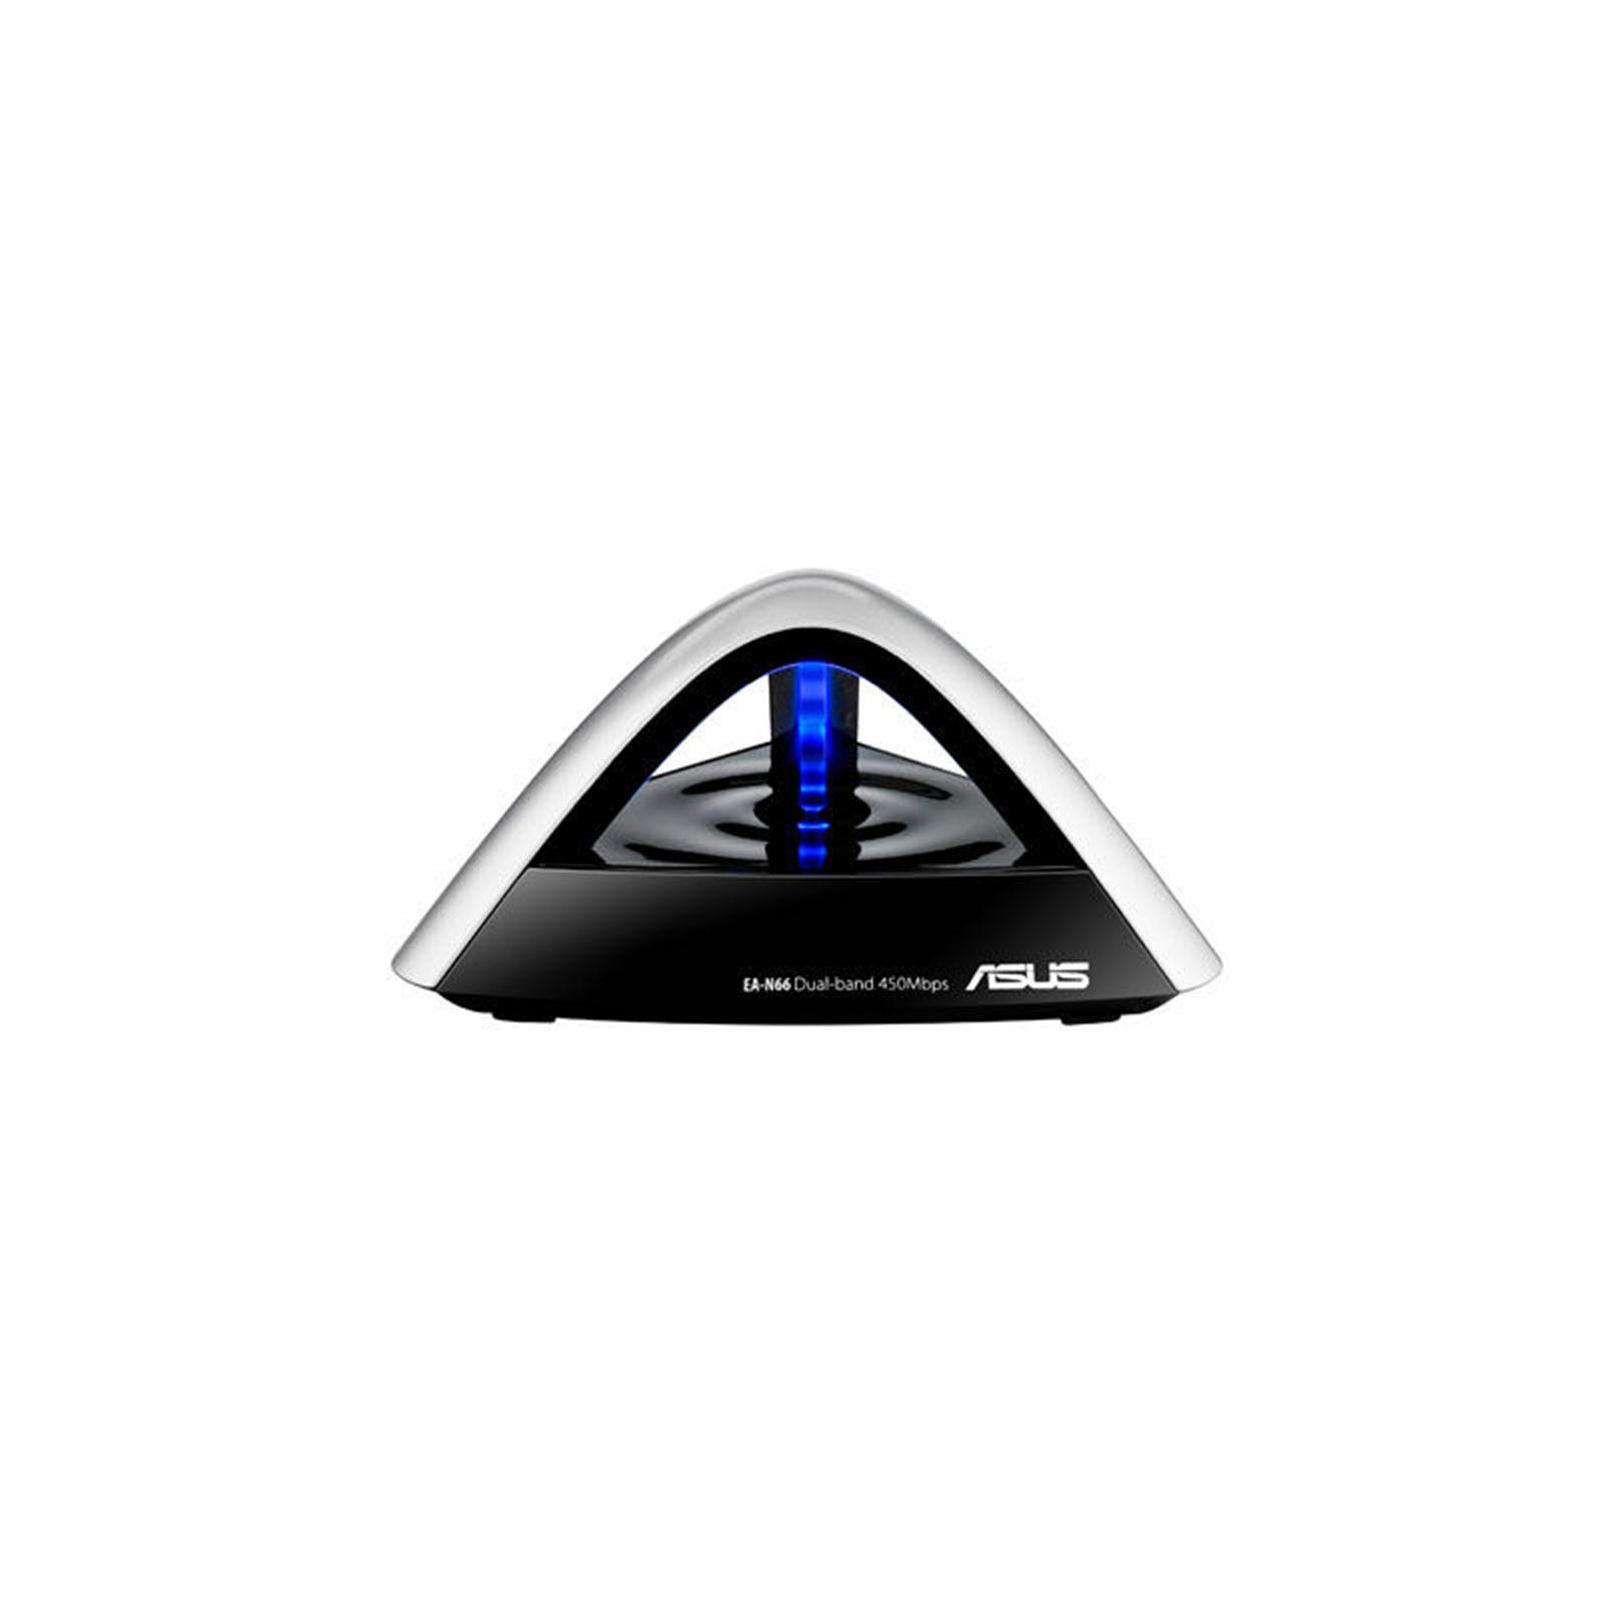 Сетевая карта Wi-Fi ASUS USB-N66 изображение 2